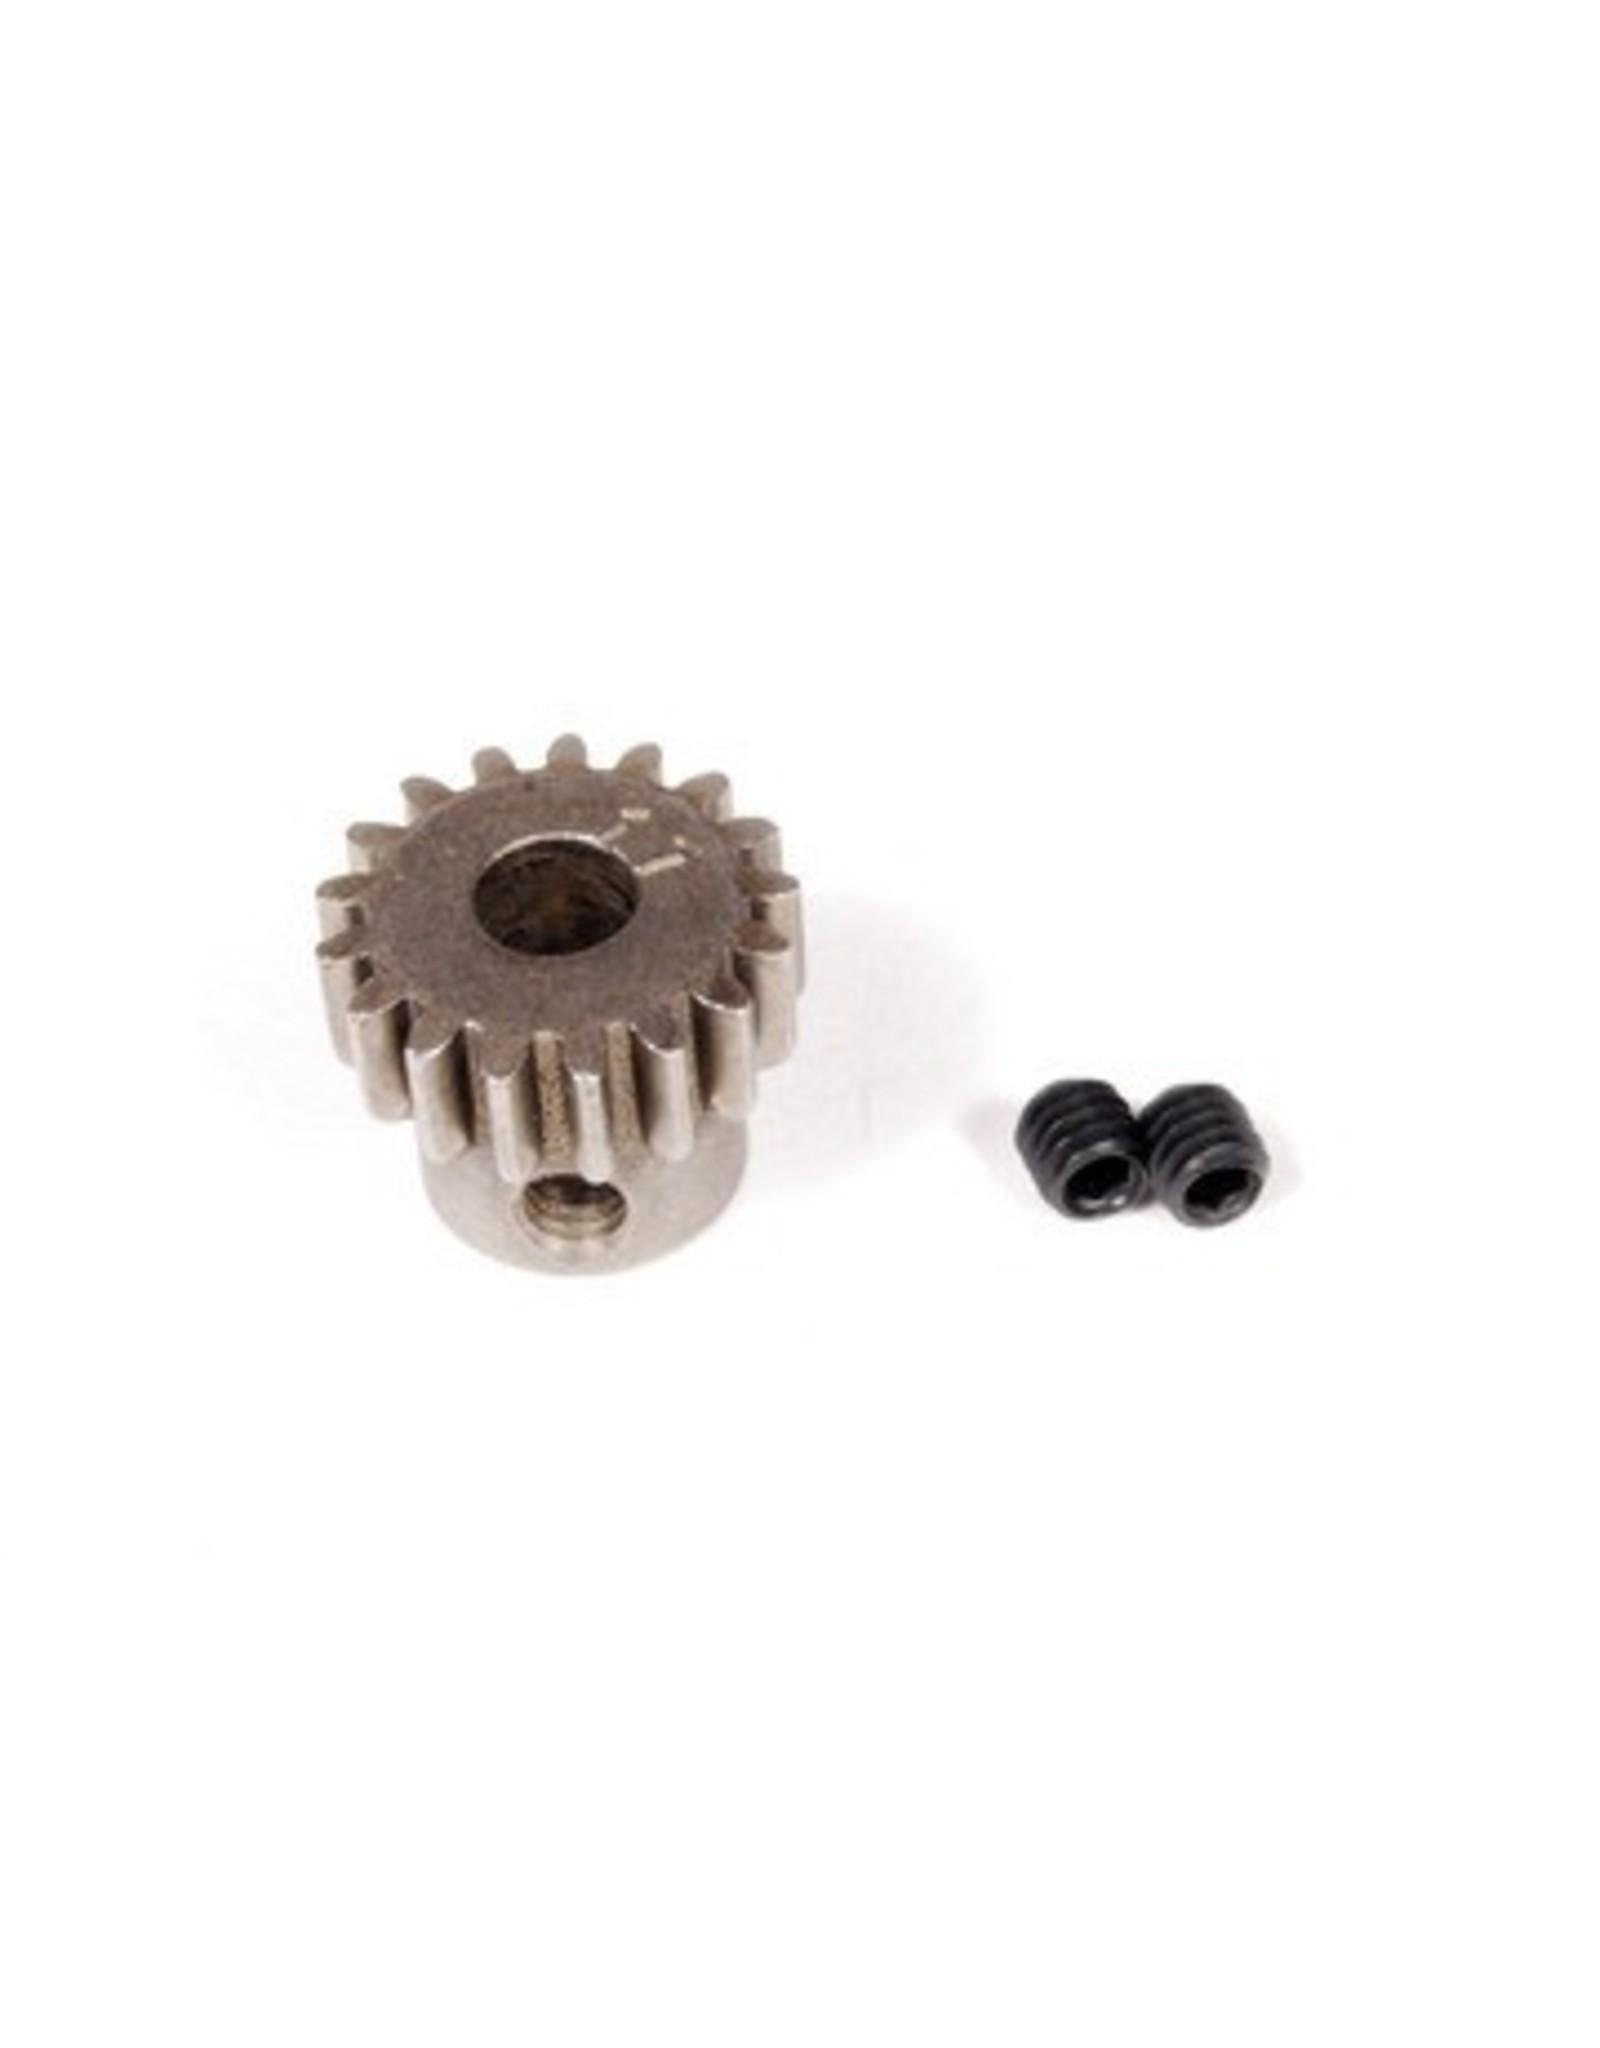 Axial Axial Pinion Gear 32P 17T Steel 5mm Motor Shaft (AX30843)